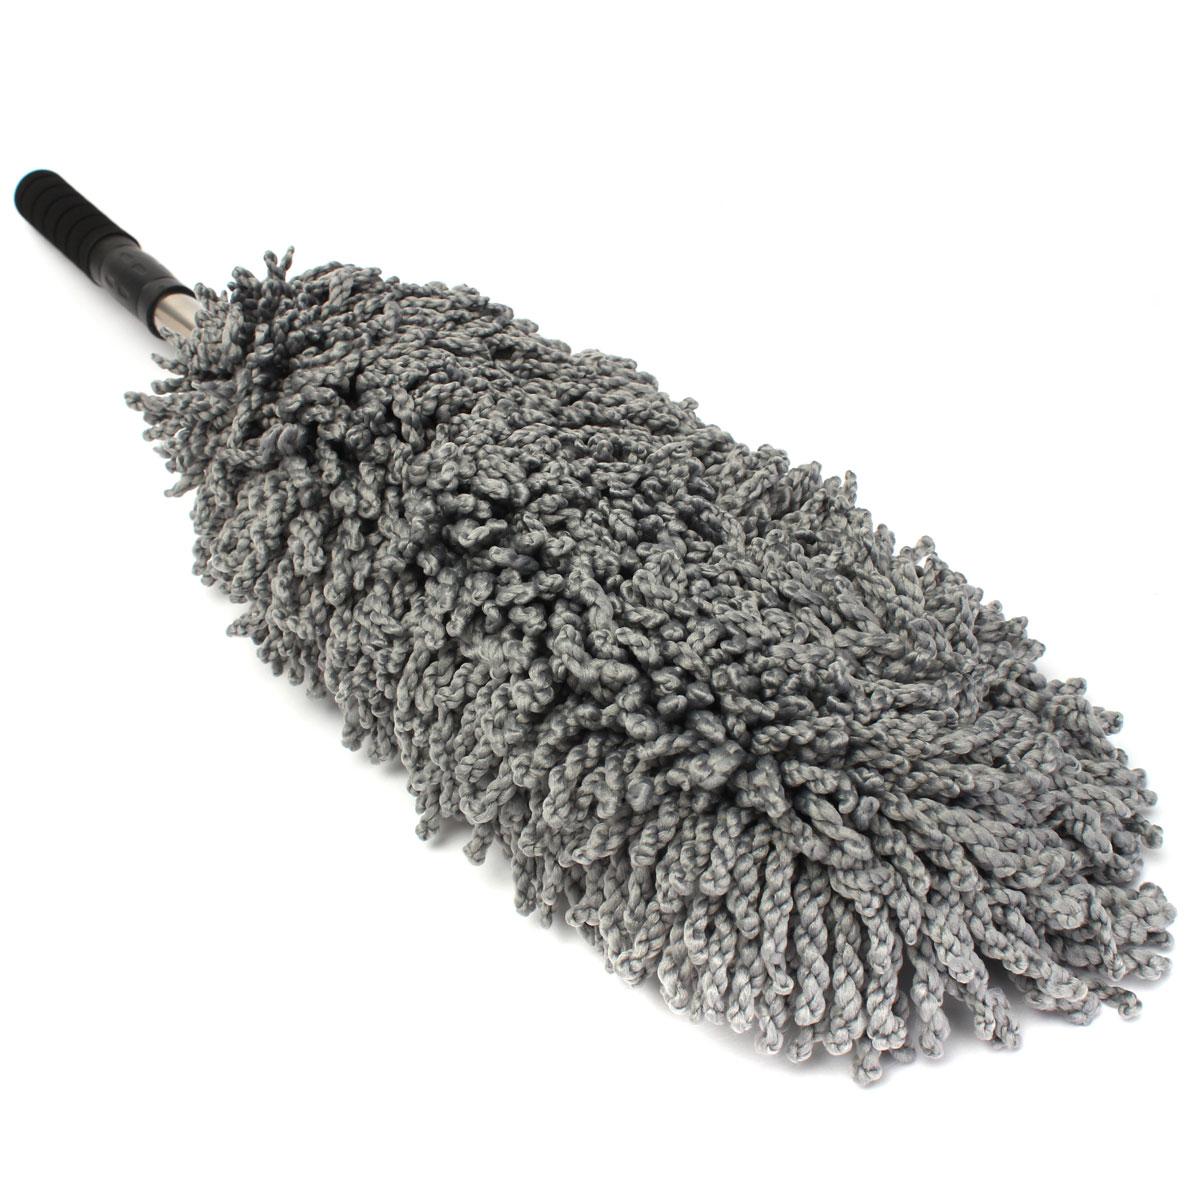 Large Microfiber Telescoping Car Wash Body Duster Brush Dirt Dust Mop